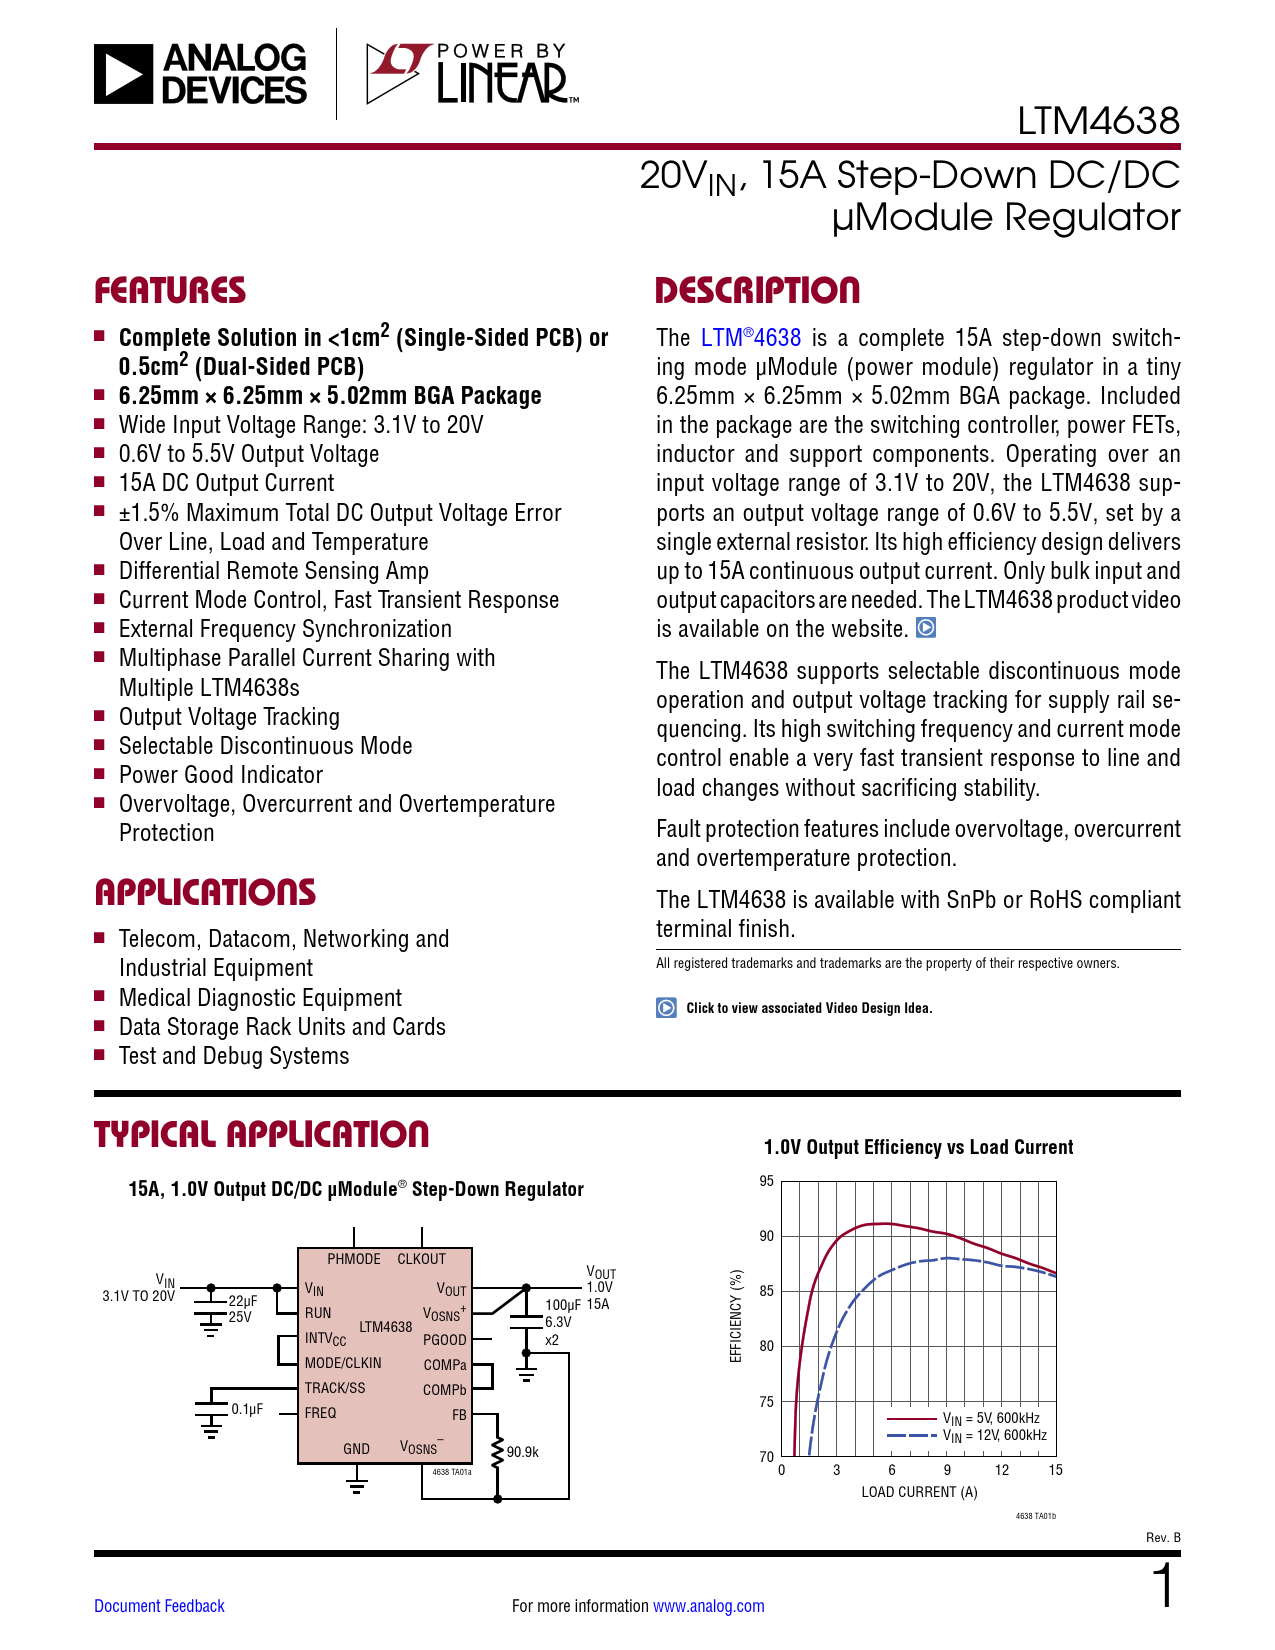 Datasheet LTM4638 Analog Devices, Версия: B